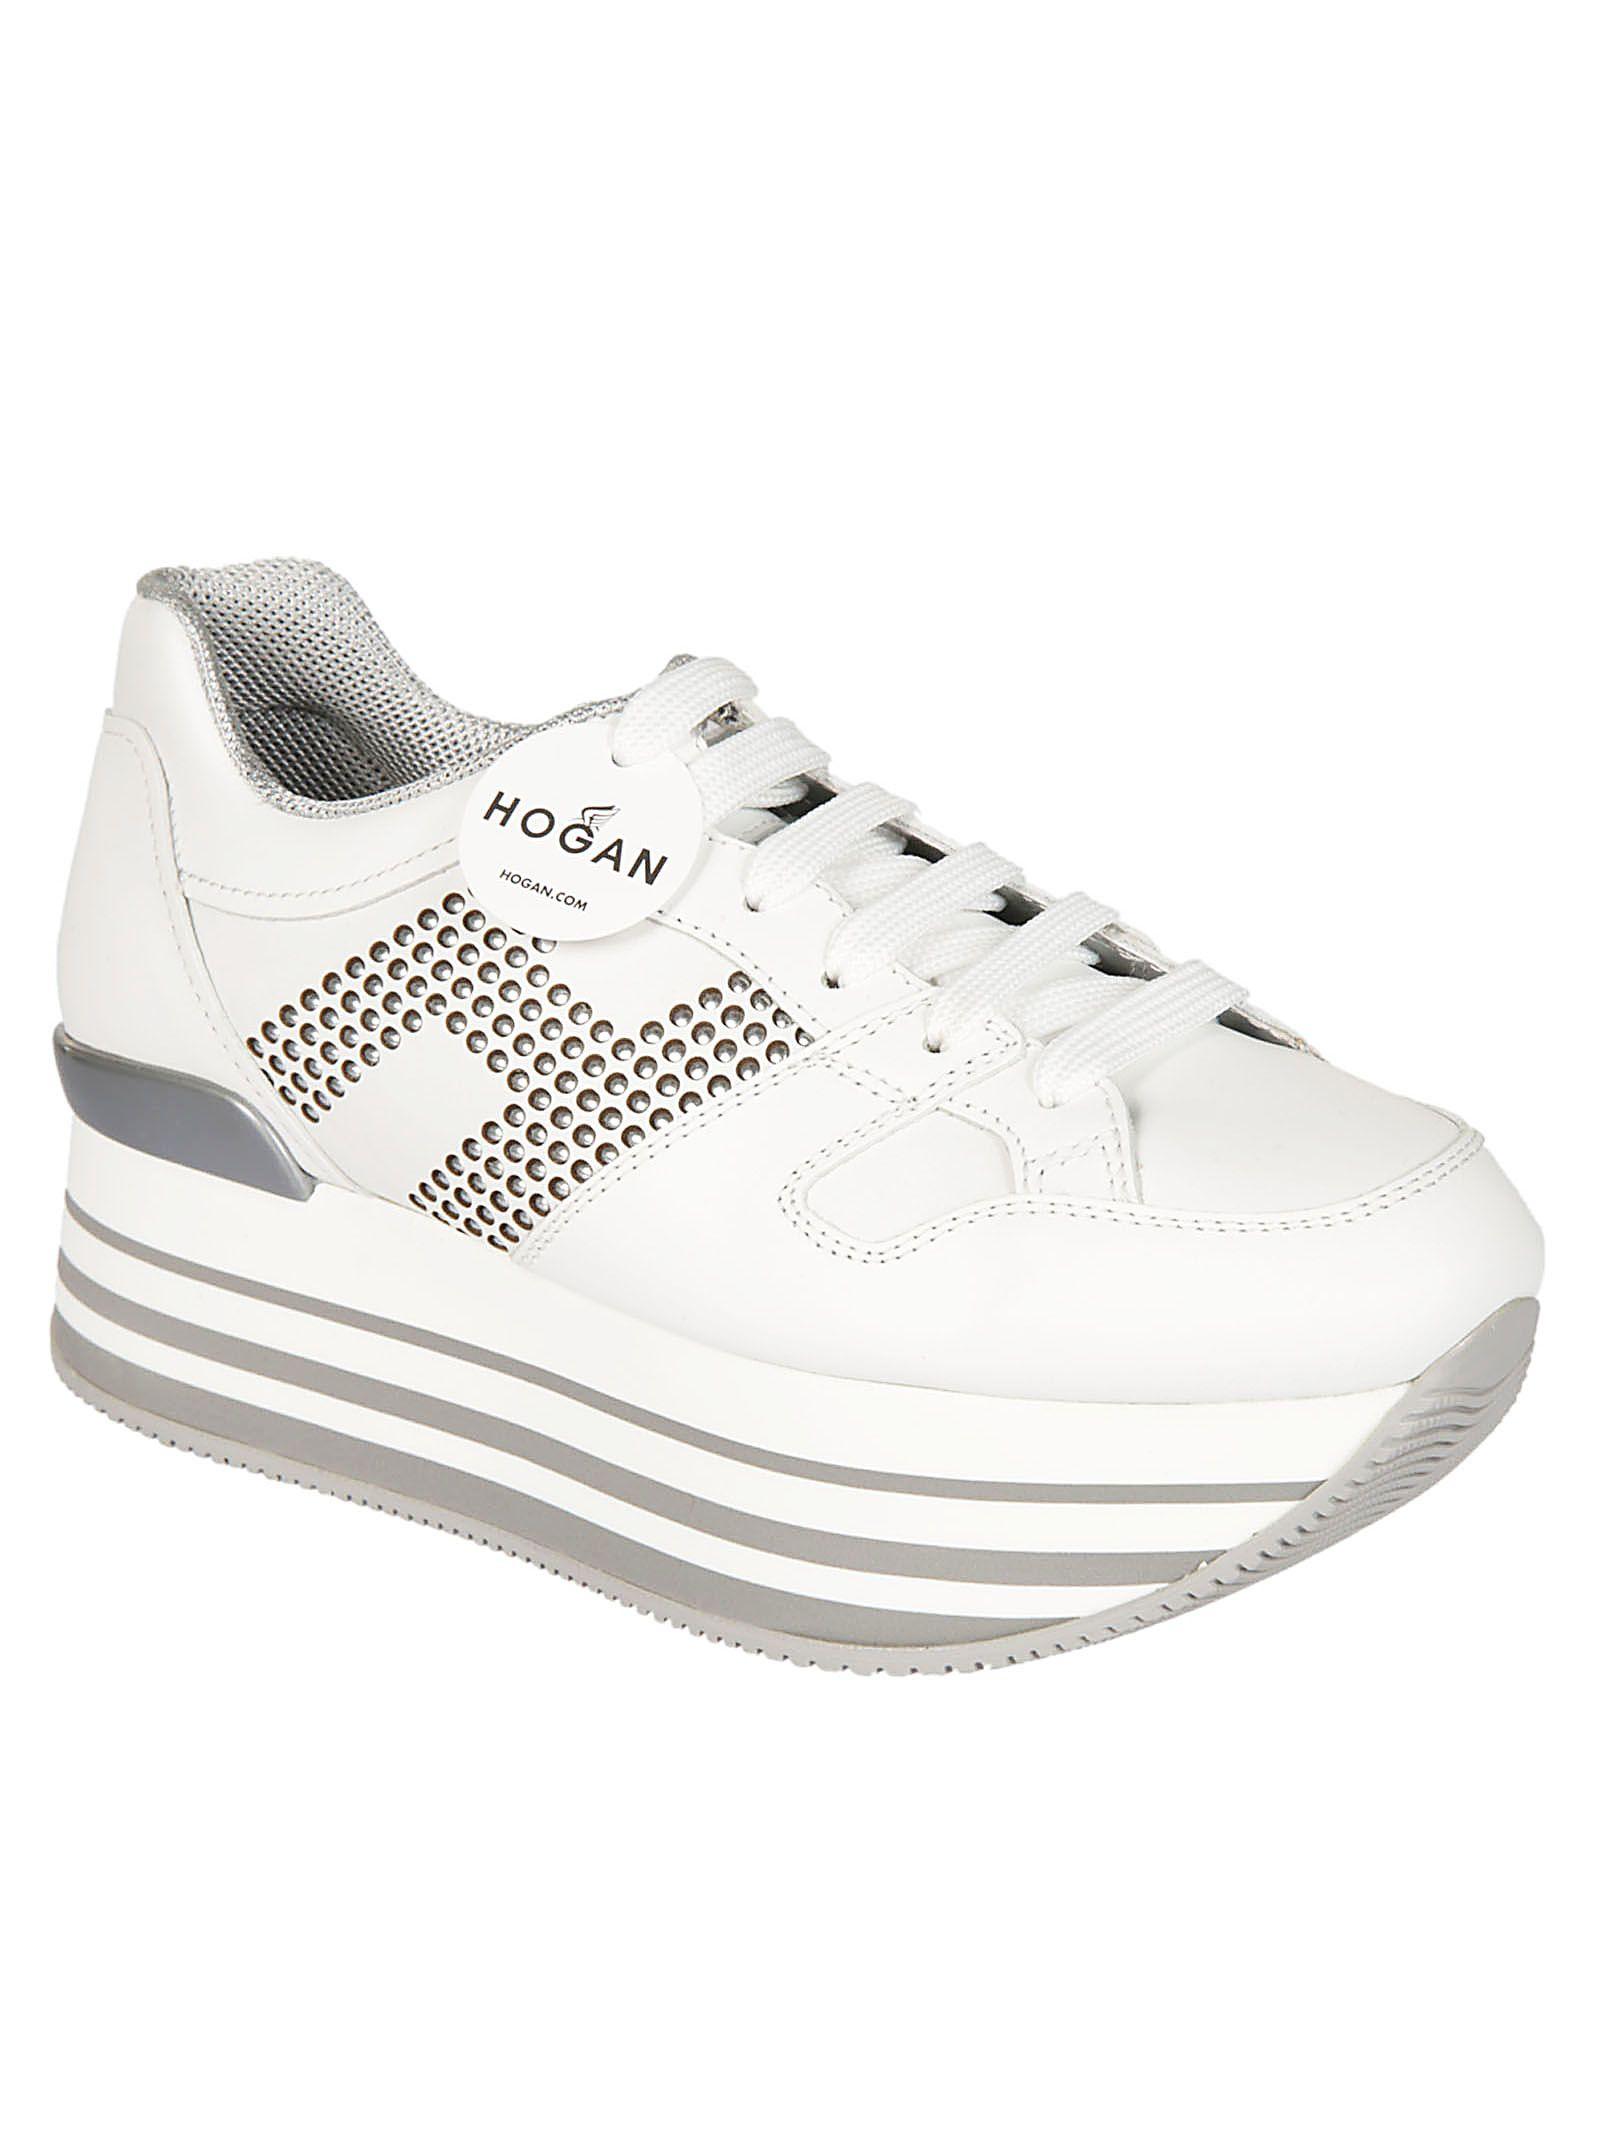 Cheap Sale 2018 New Designer Hogan Studded Logo Platform Sneakers Footaction Sale Online Outlet Low Shipping fjvciX